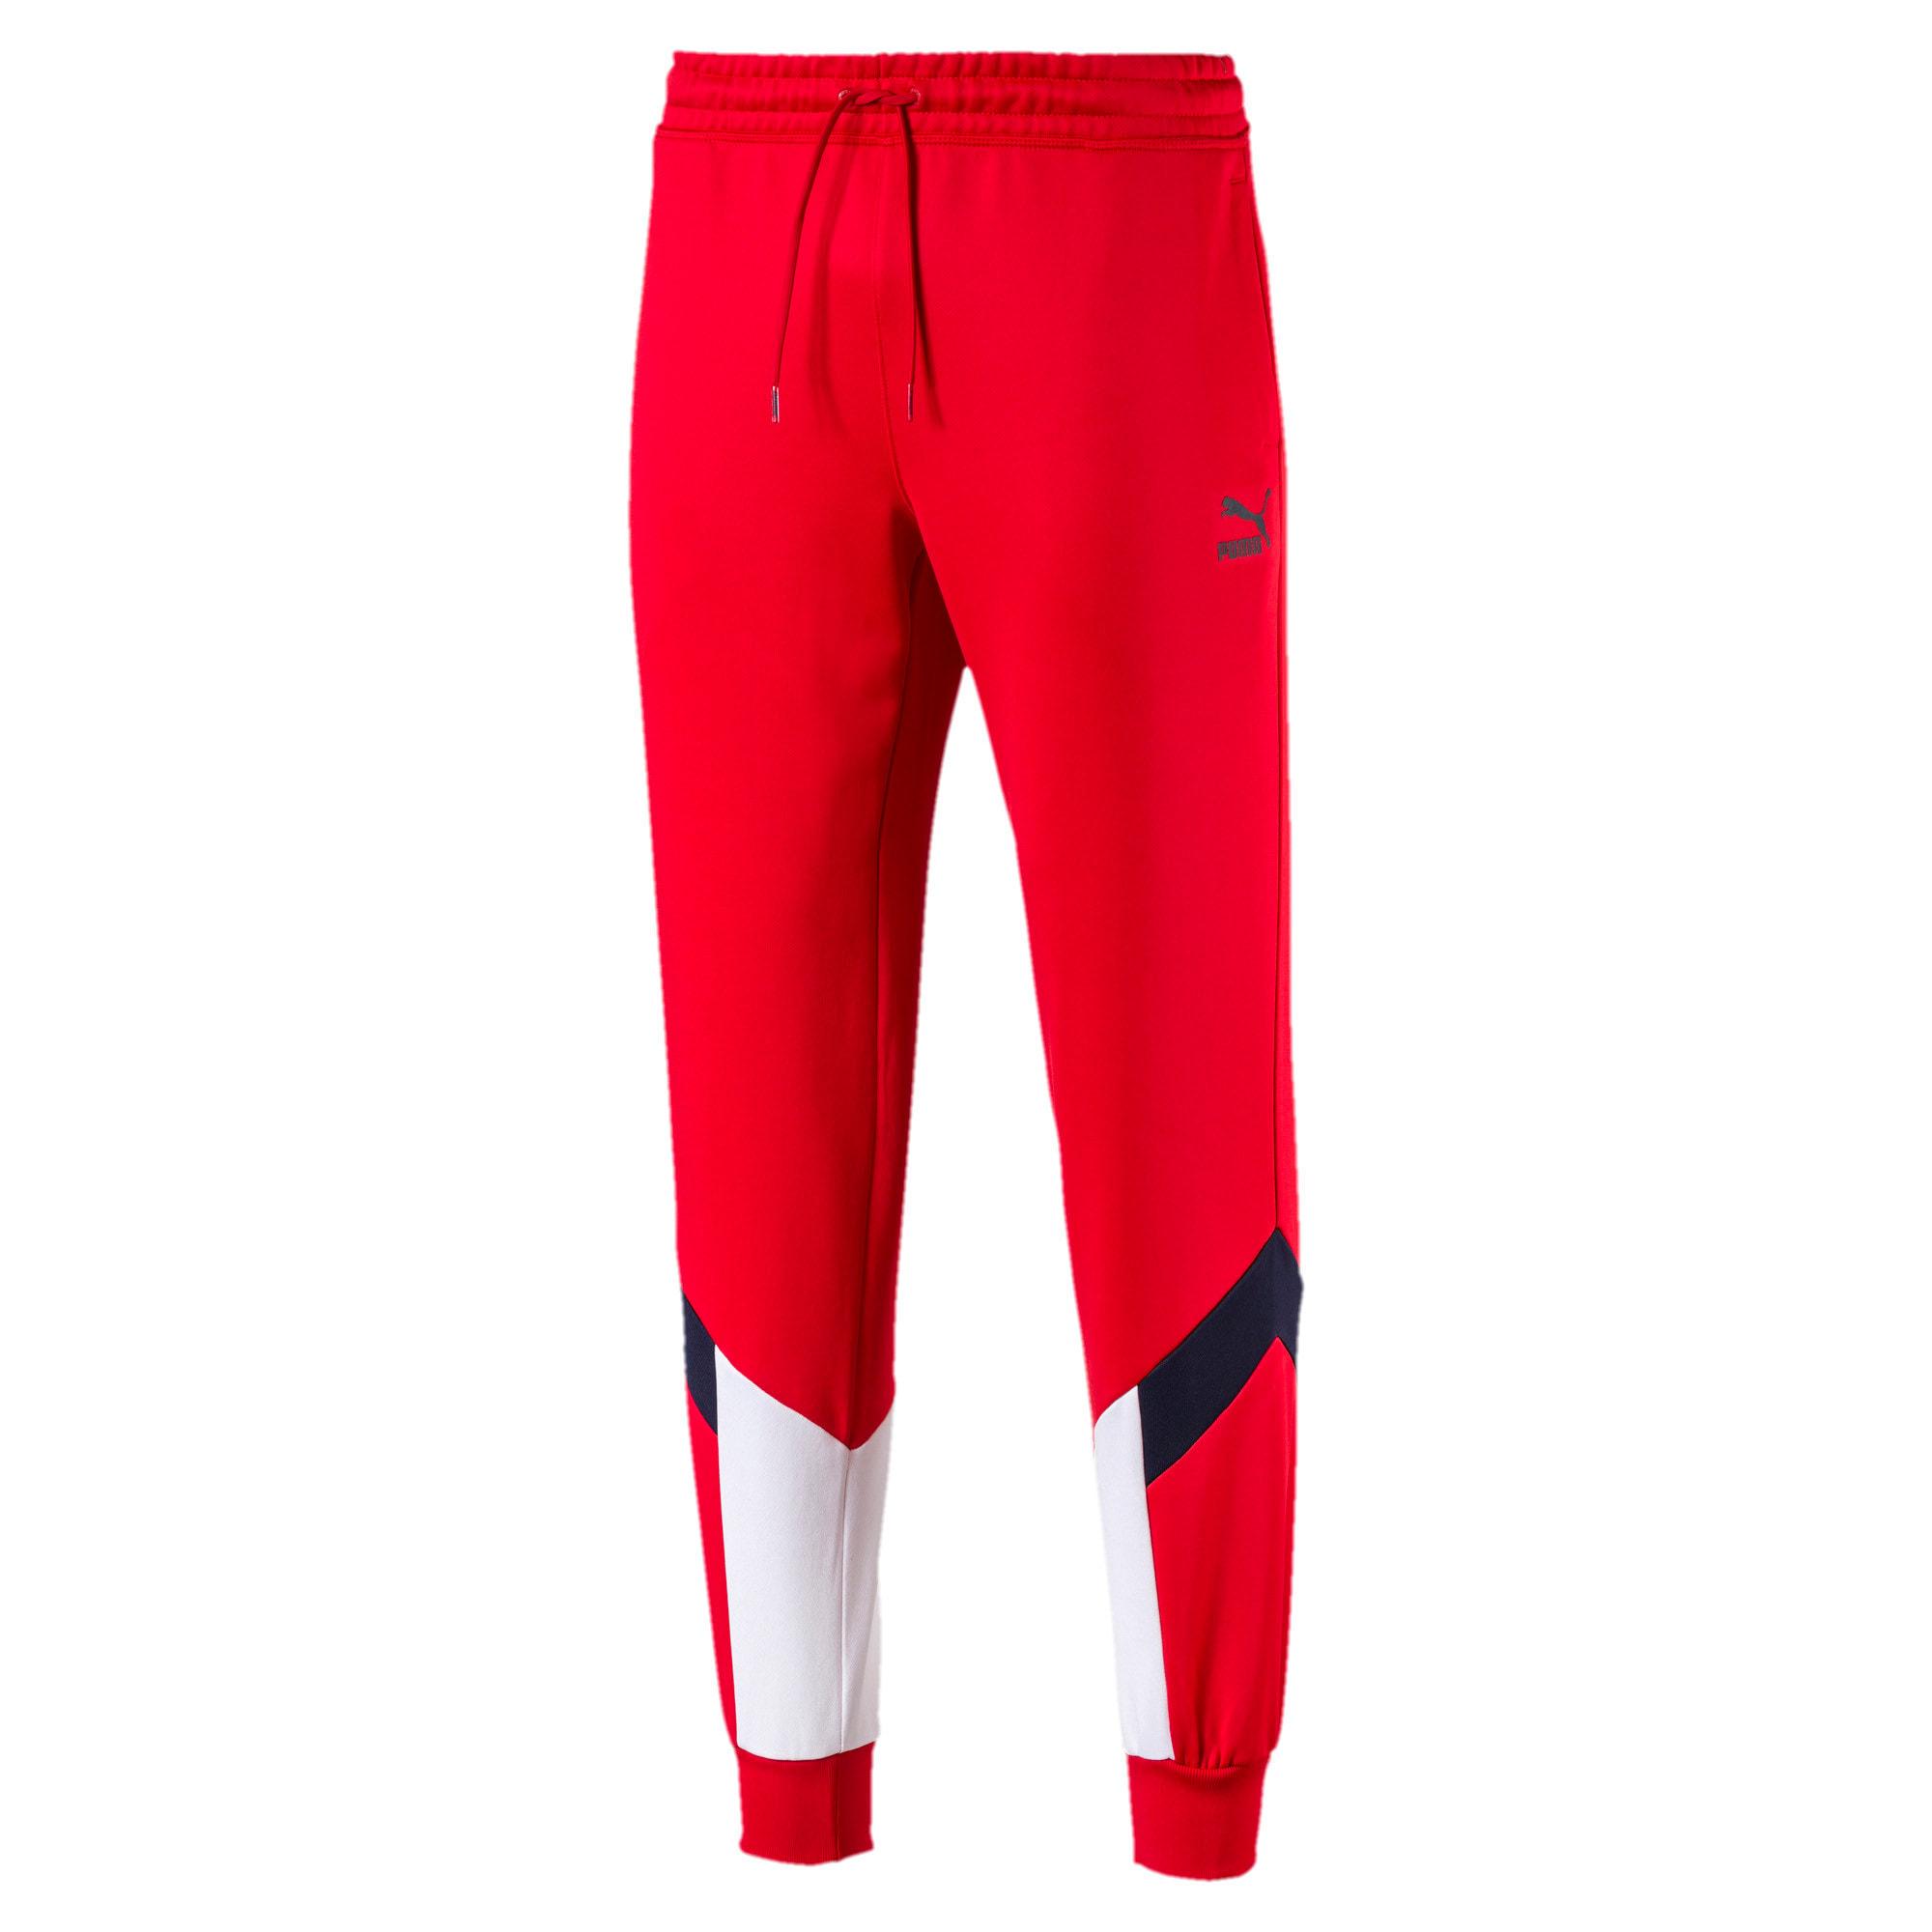 Thumbnail 1 of Iconic MCS Men's Track Pants, High Risk Red, medium